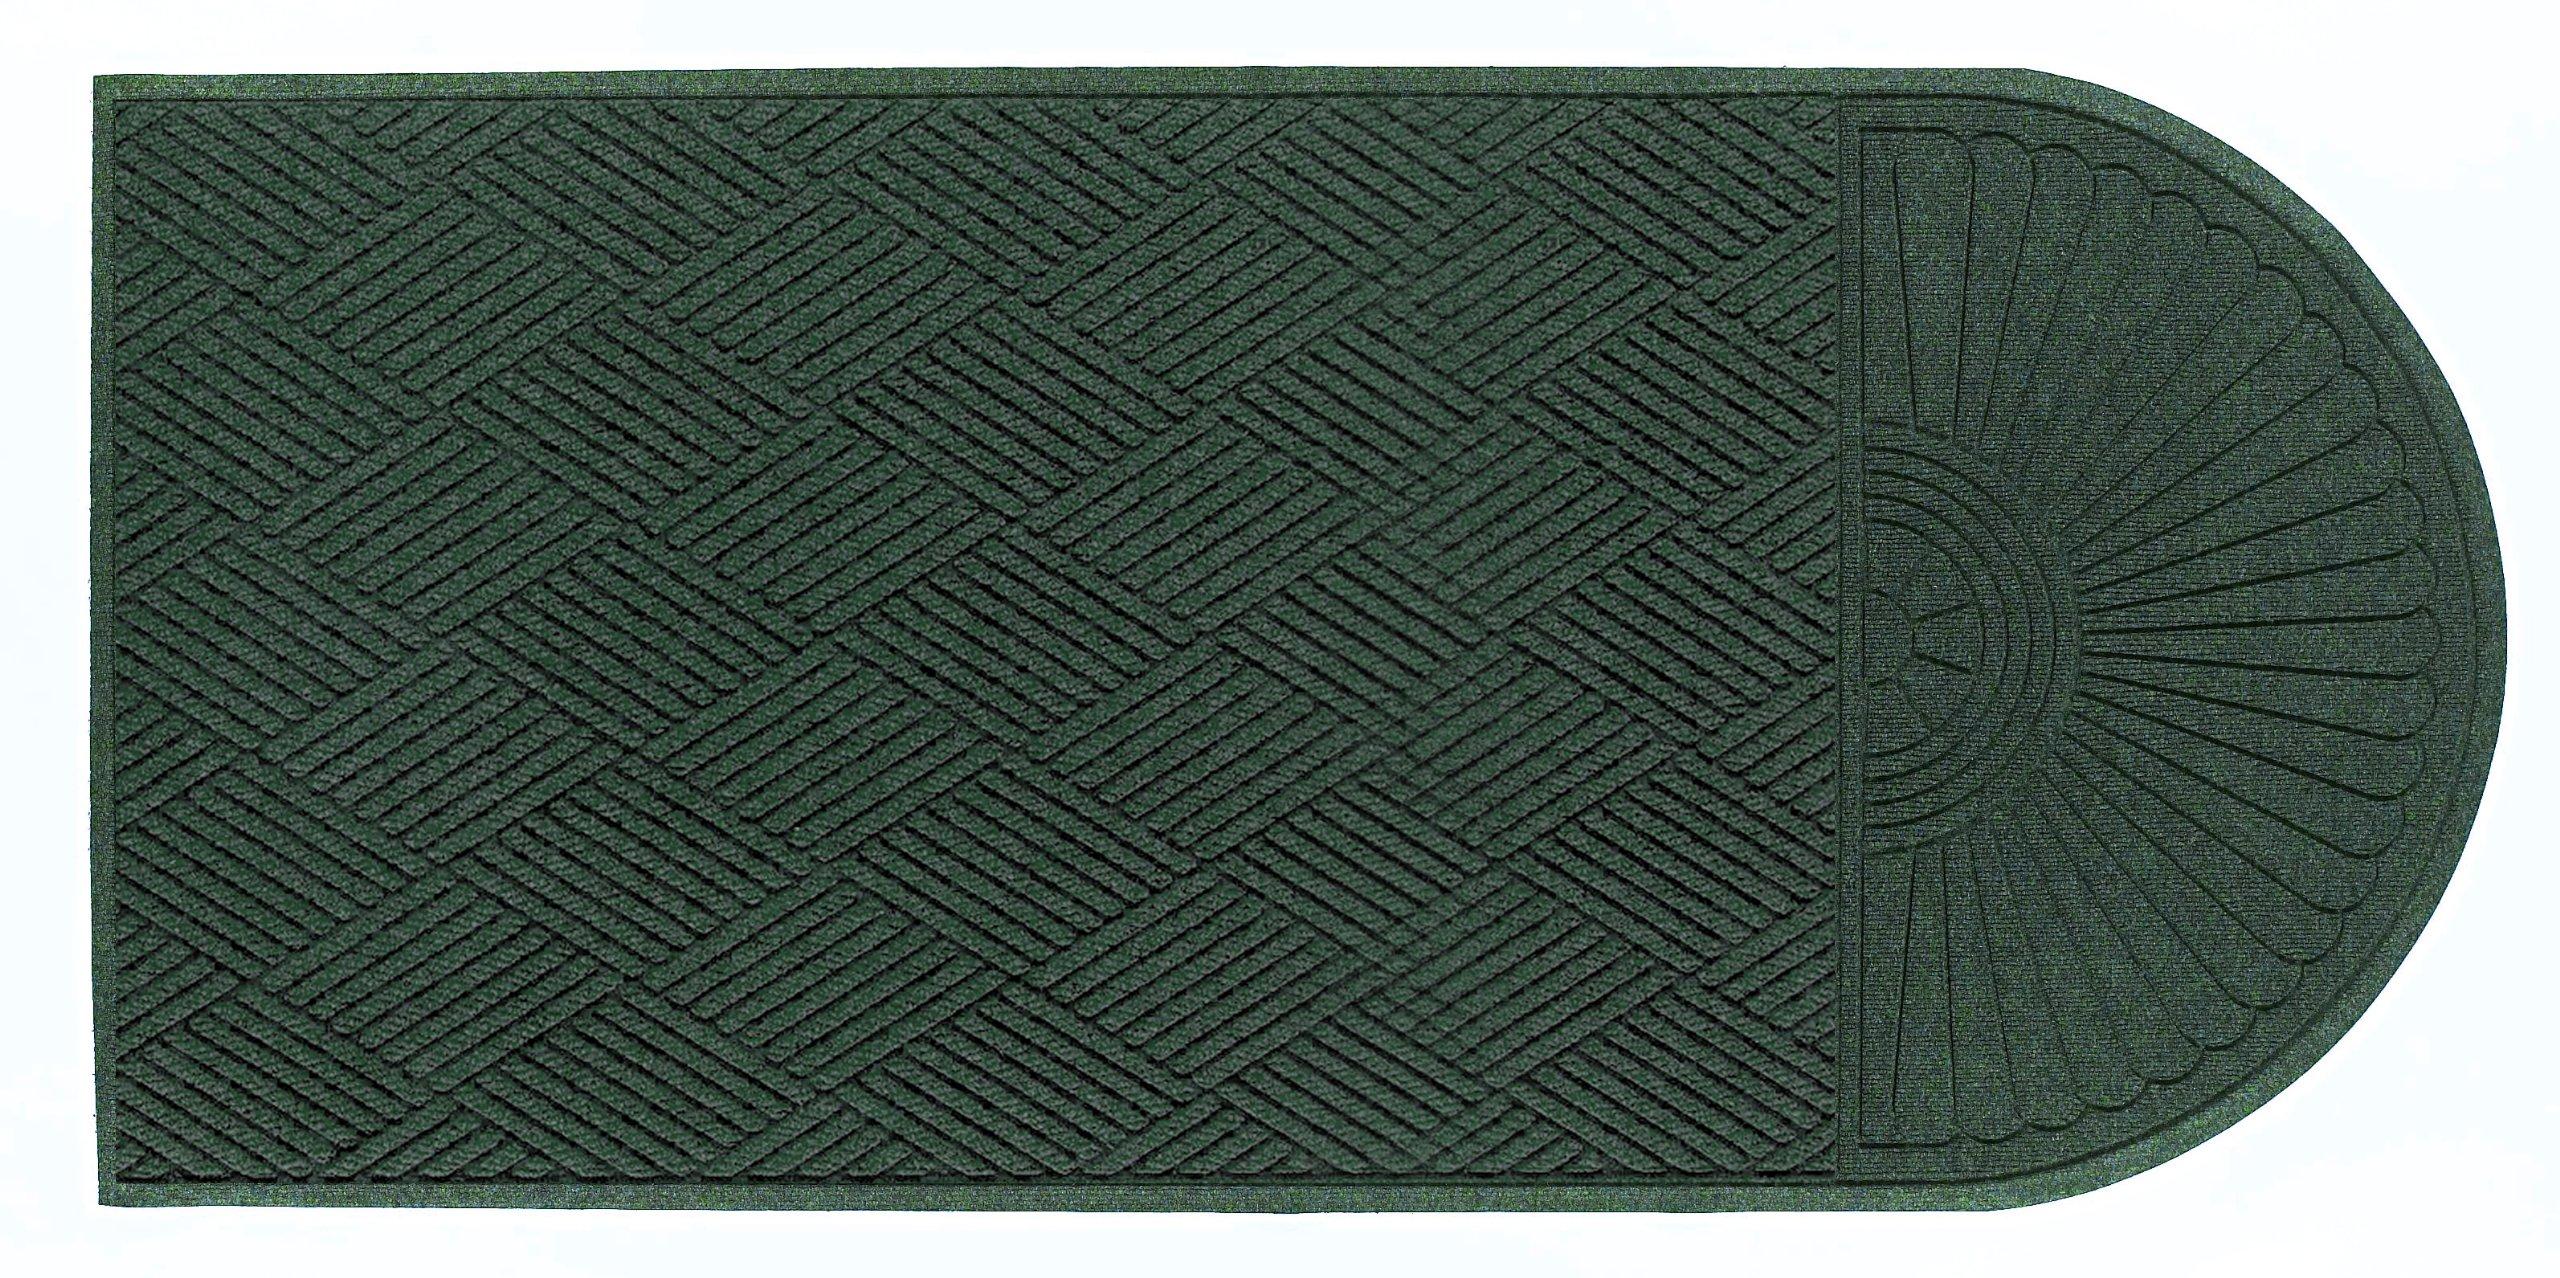 "M+A Matting 22248 Waterhog Eco Grand Premier PET Polyester Fiber Single End Entrance Indoor/Outdoor Floor Mat, SBR Rubber Backing, 5.9' Length x 4' Width, 3/8"" Thick, Southern Pine"